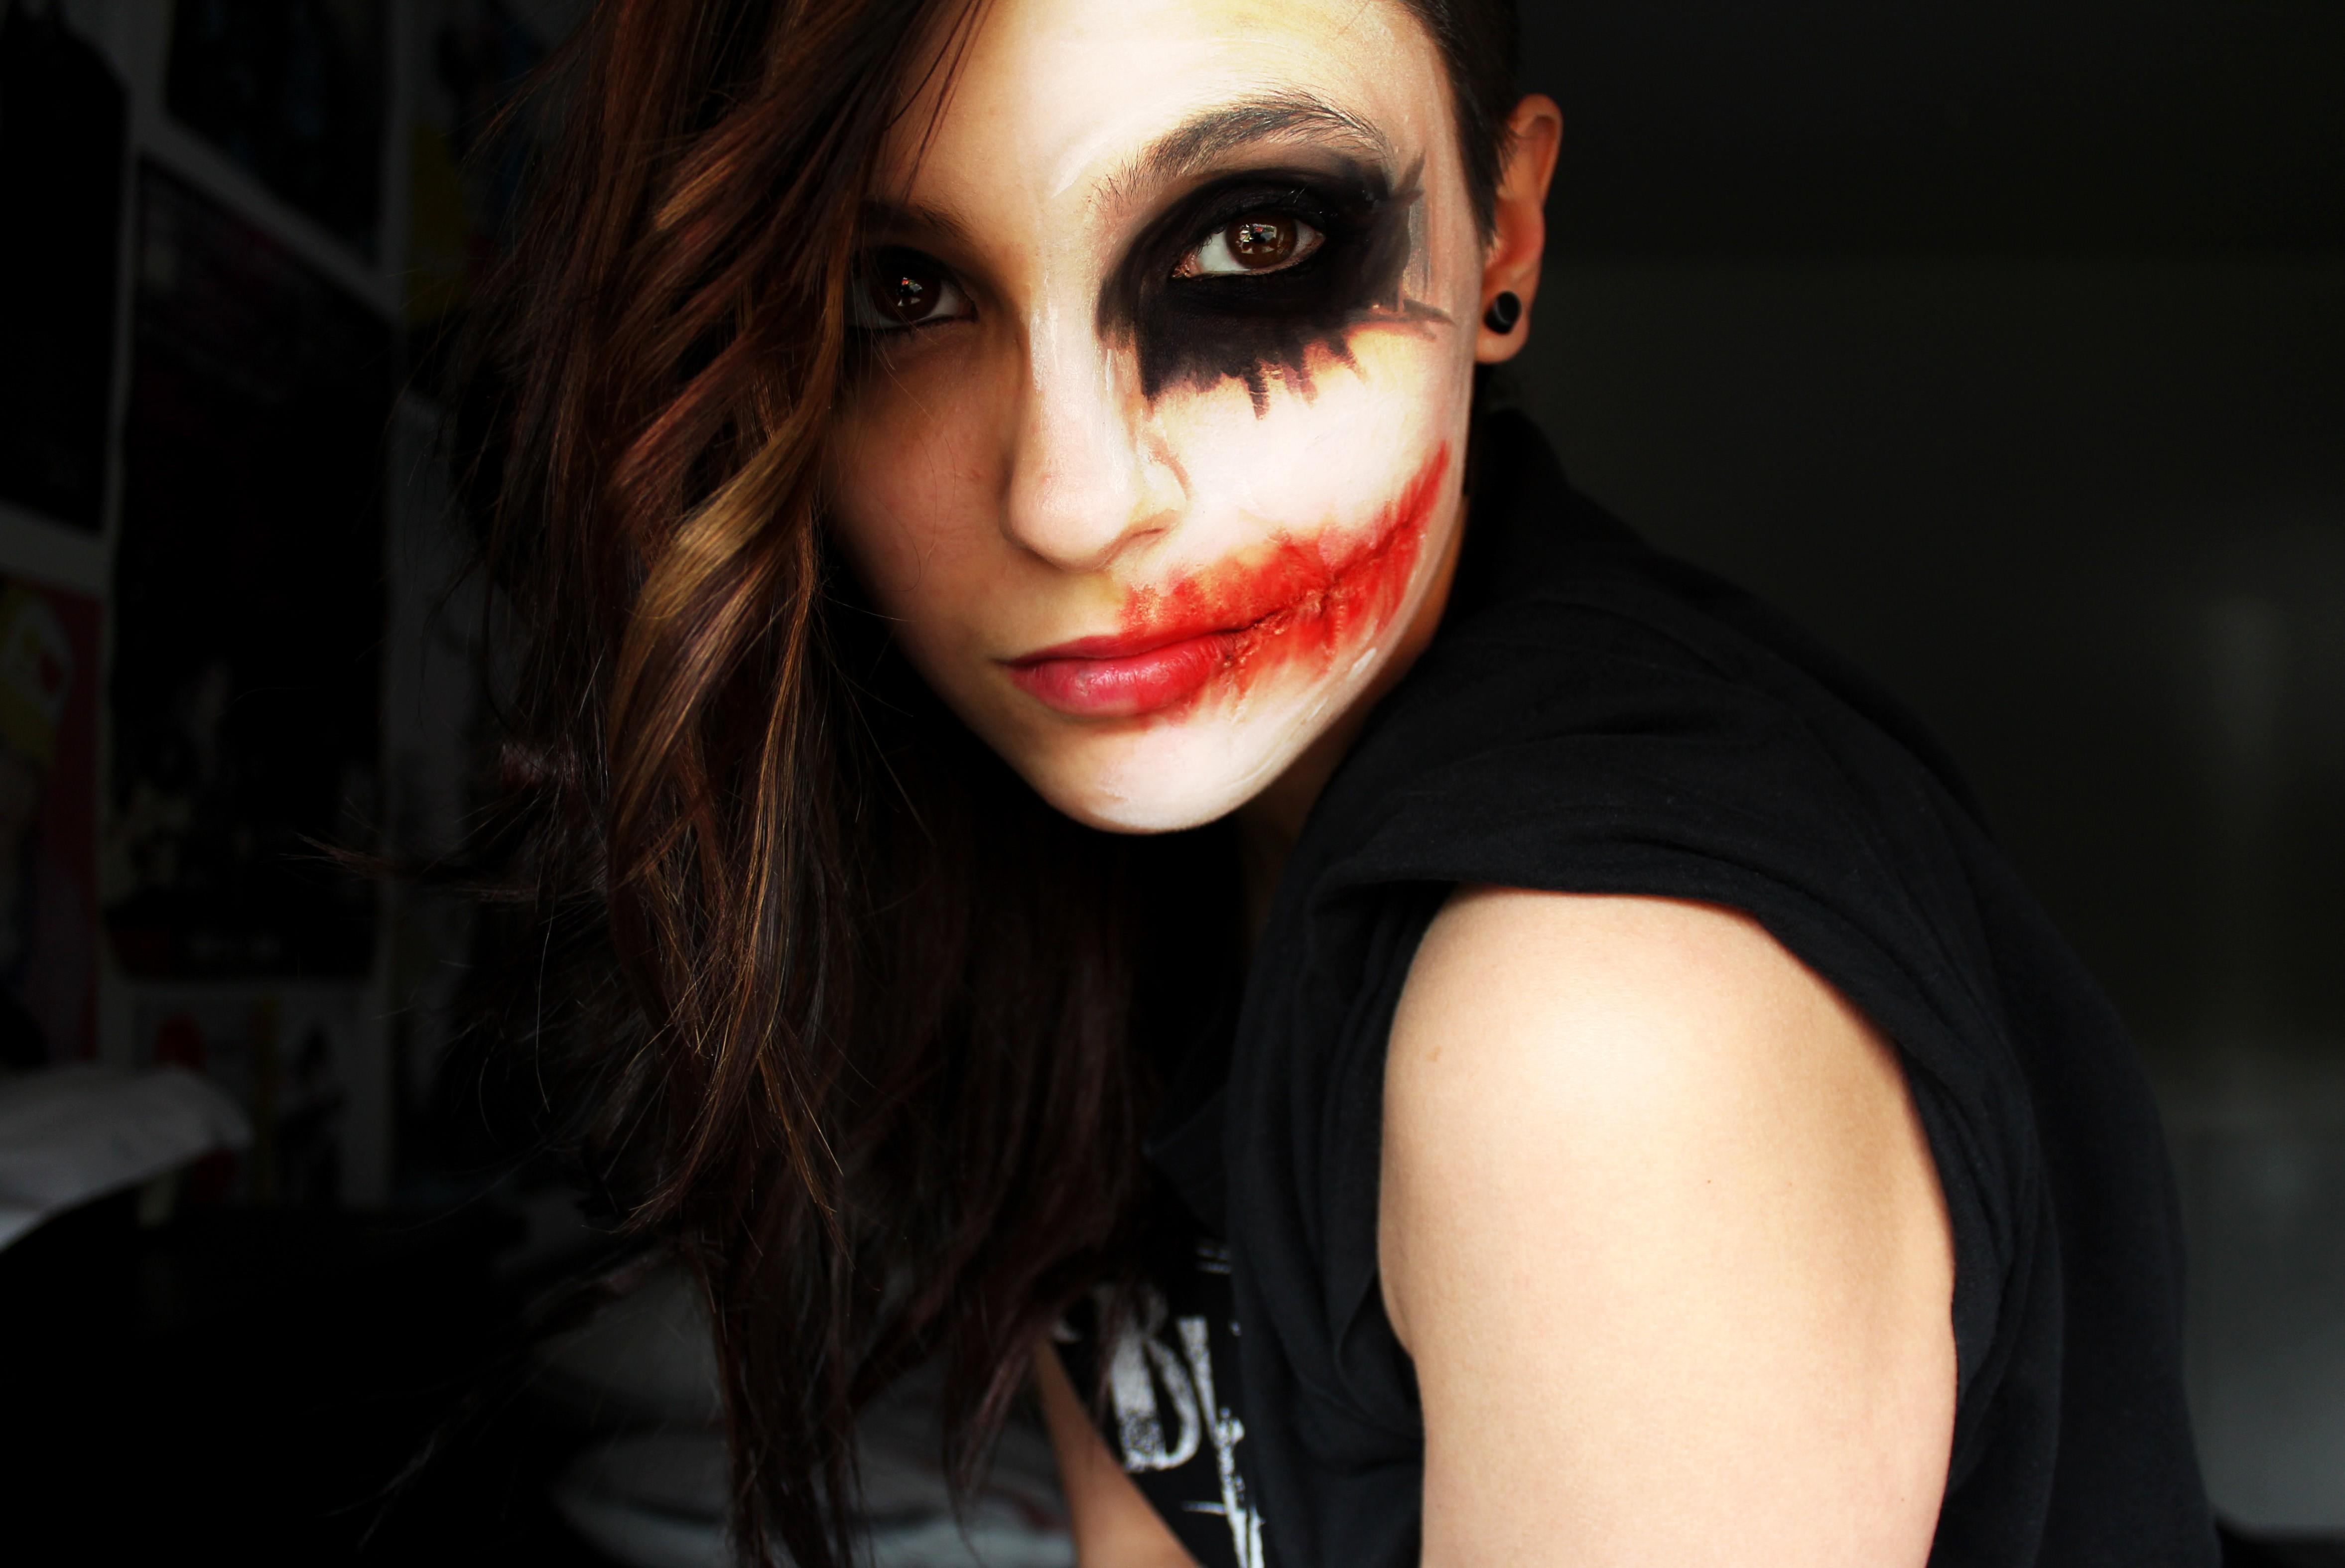 Joker Girl Makeup 5k Hd Girls 4k Wallpapers Images